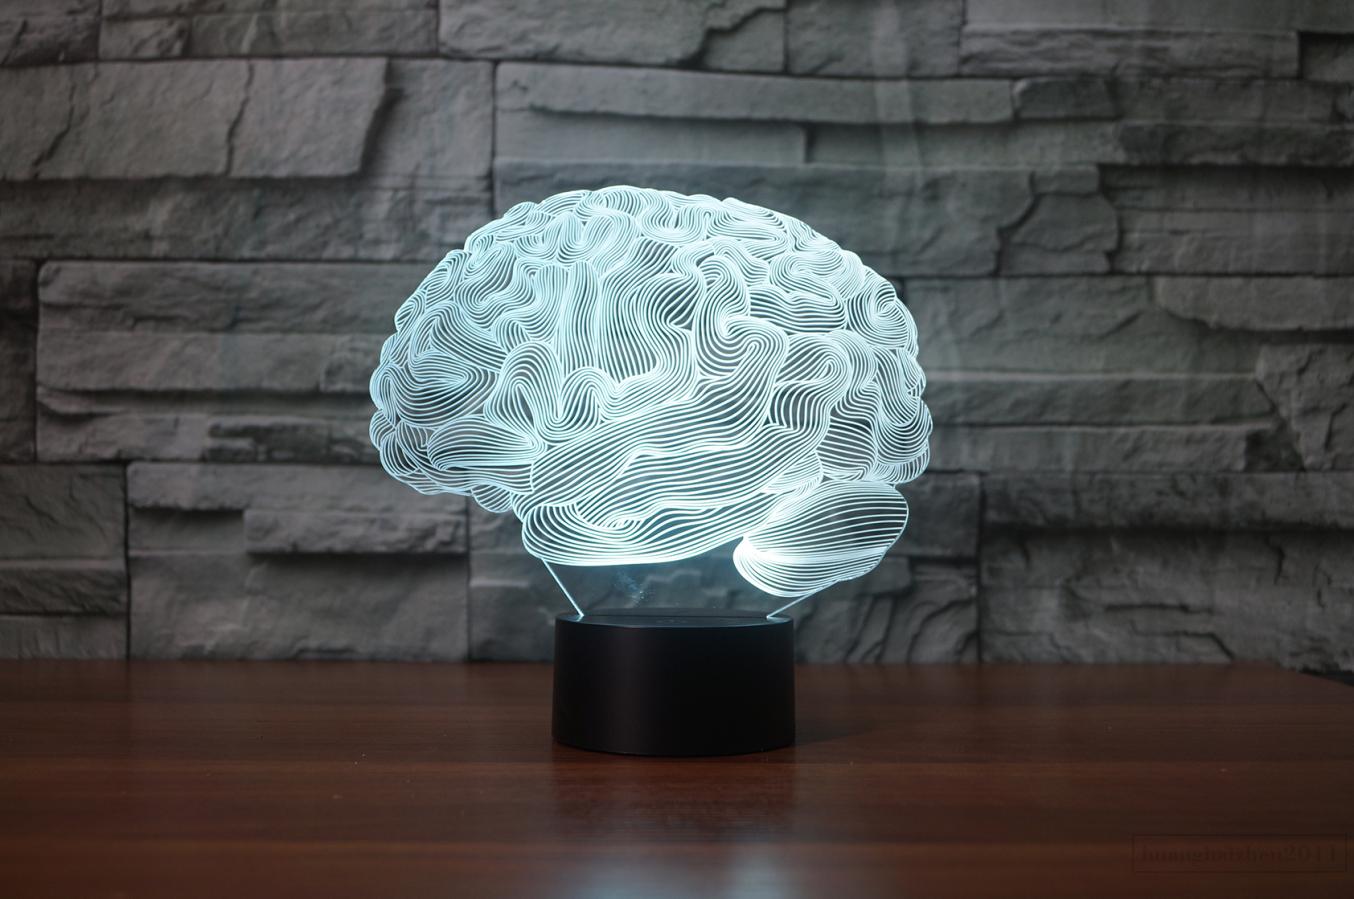 Resultado de imagen para brain changing illustrations